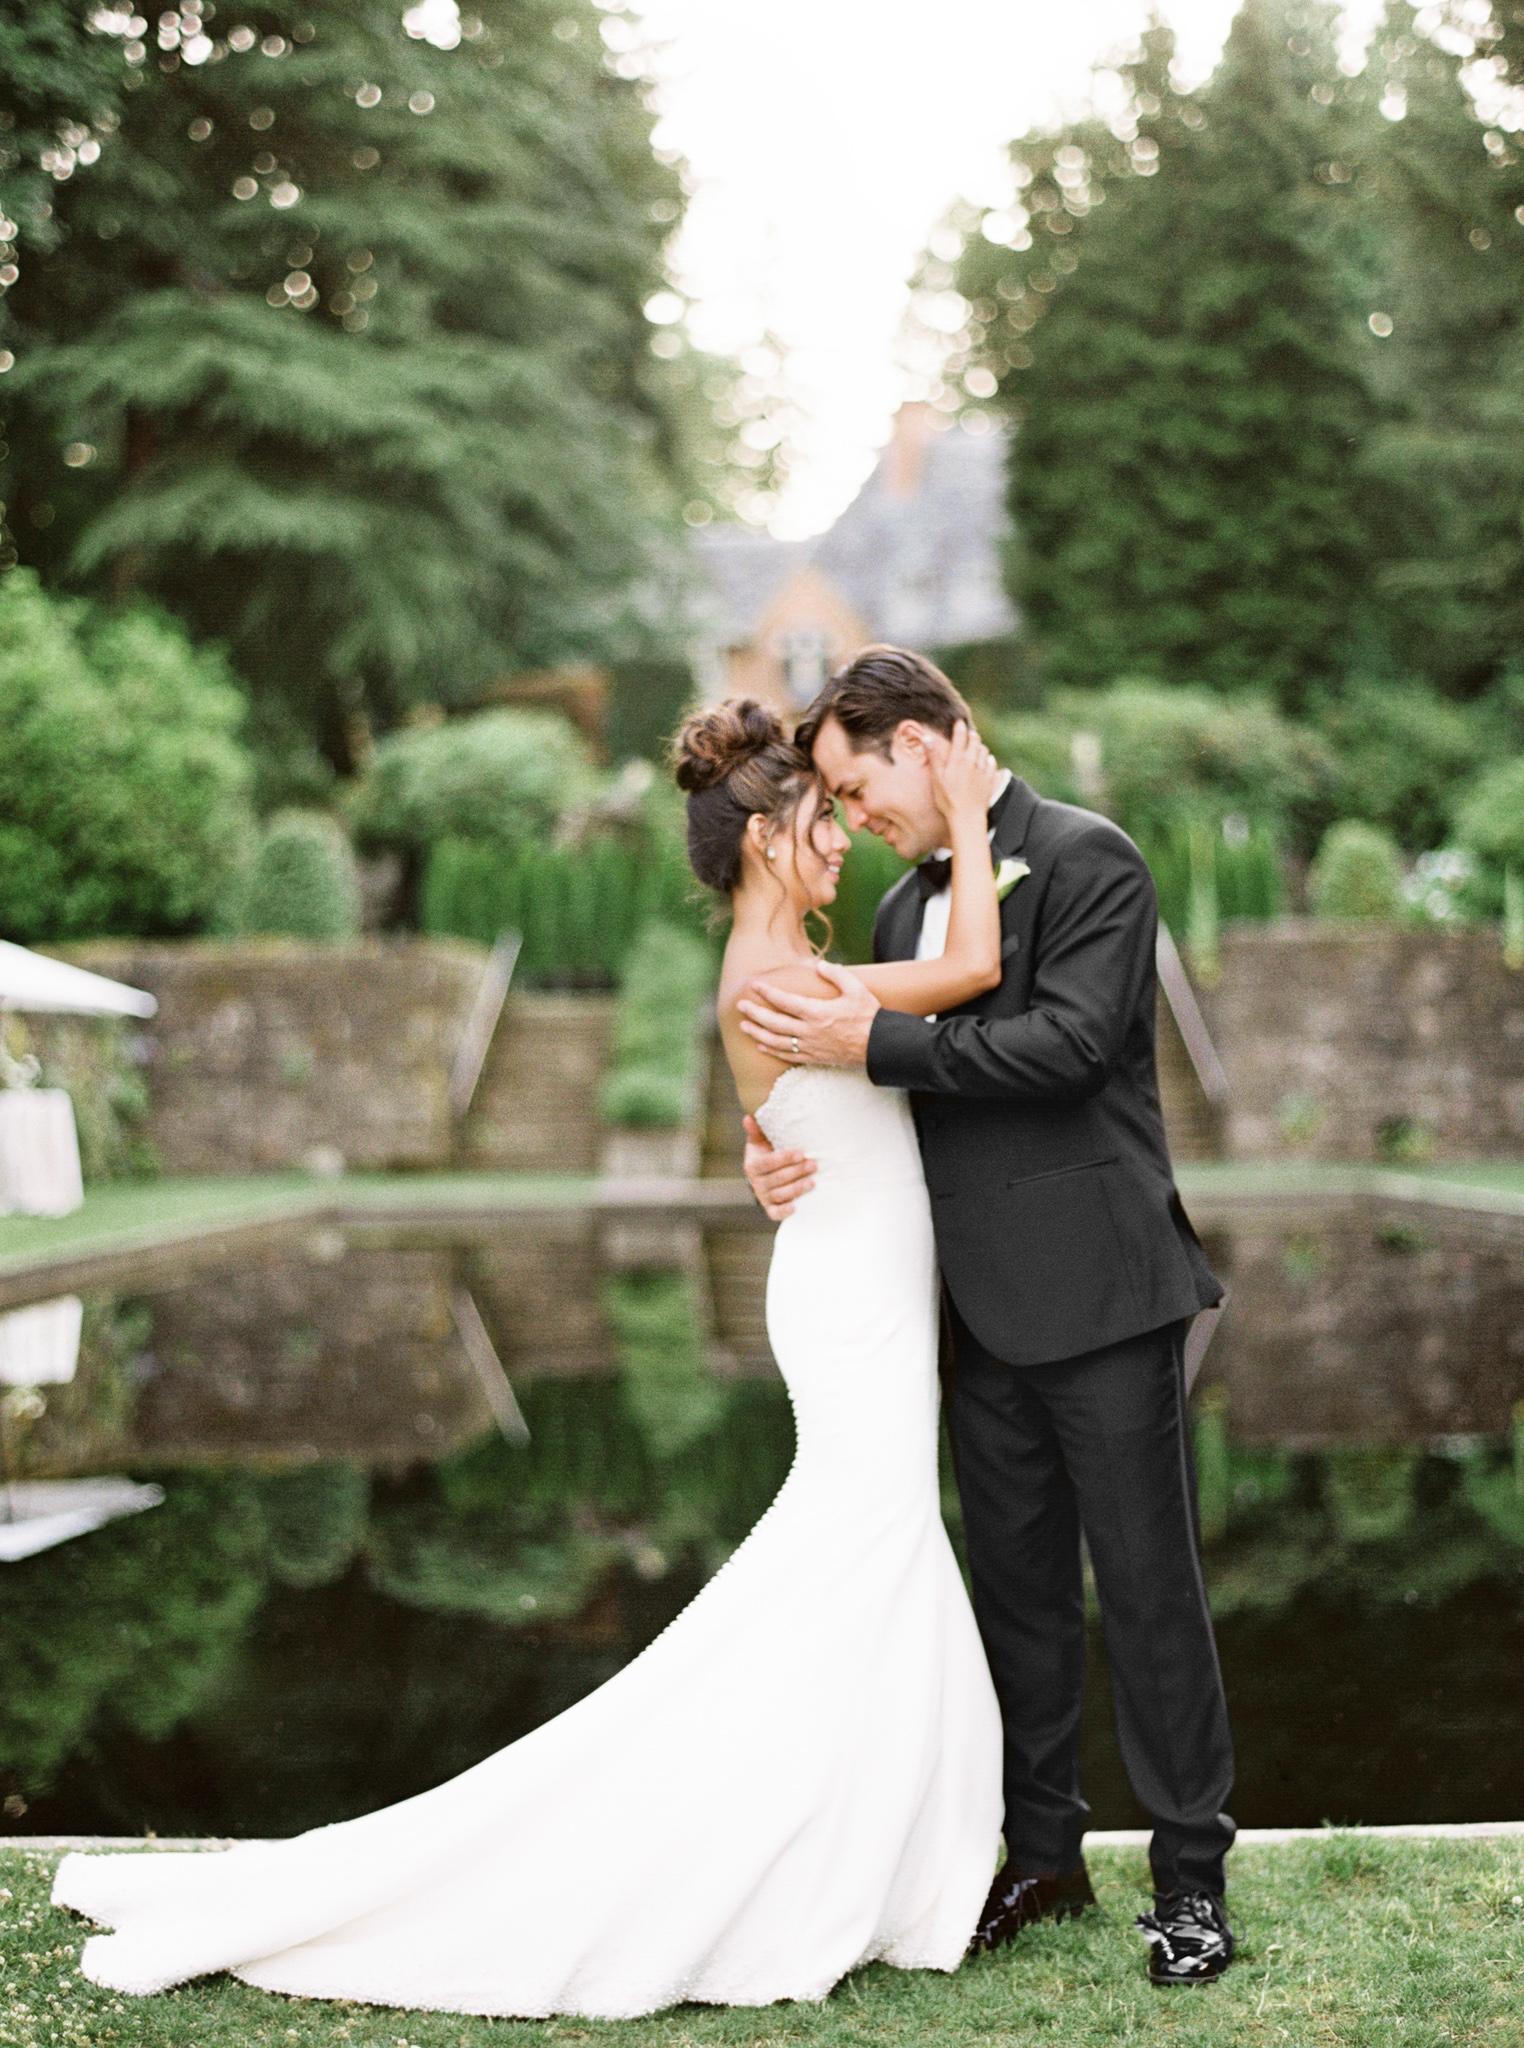 083OutliveCreative_Travel_Photographer_Videographer_Lewis&Clark_Oregon_Elegant_BlackTie_Destination_Wedding.jpg